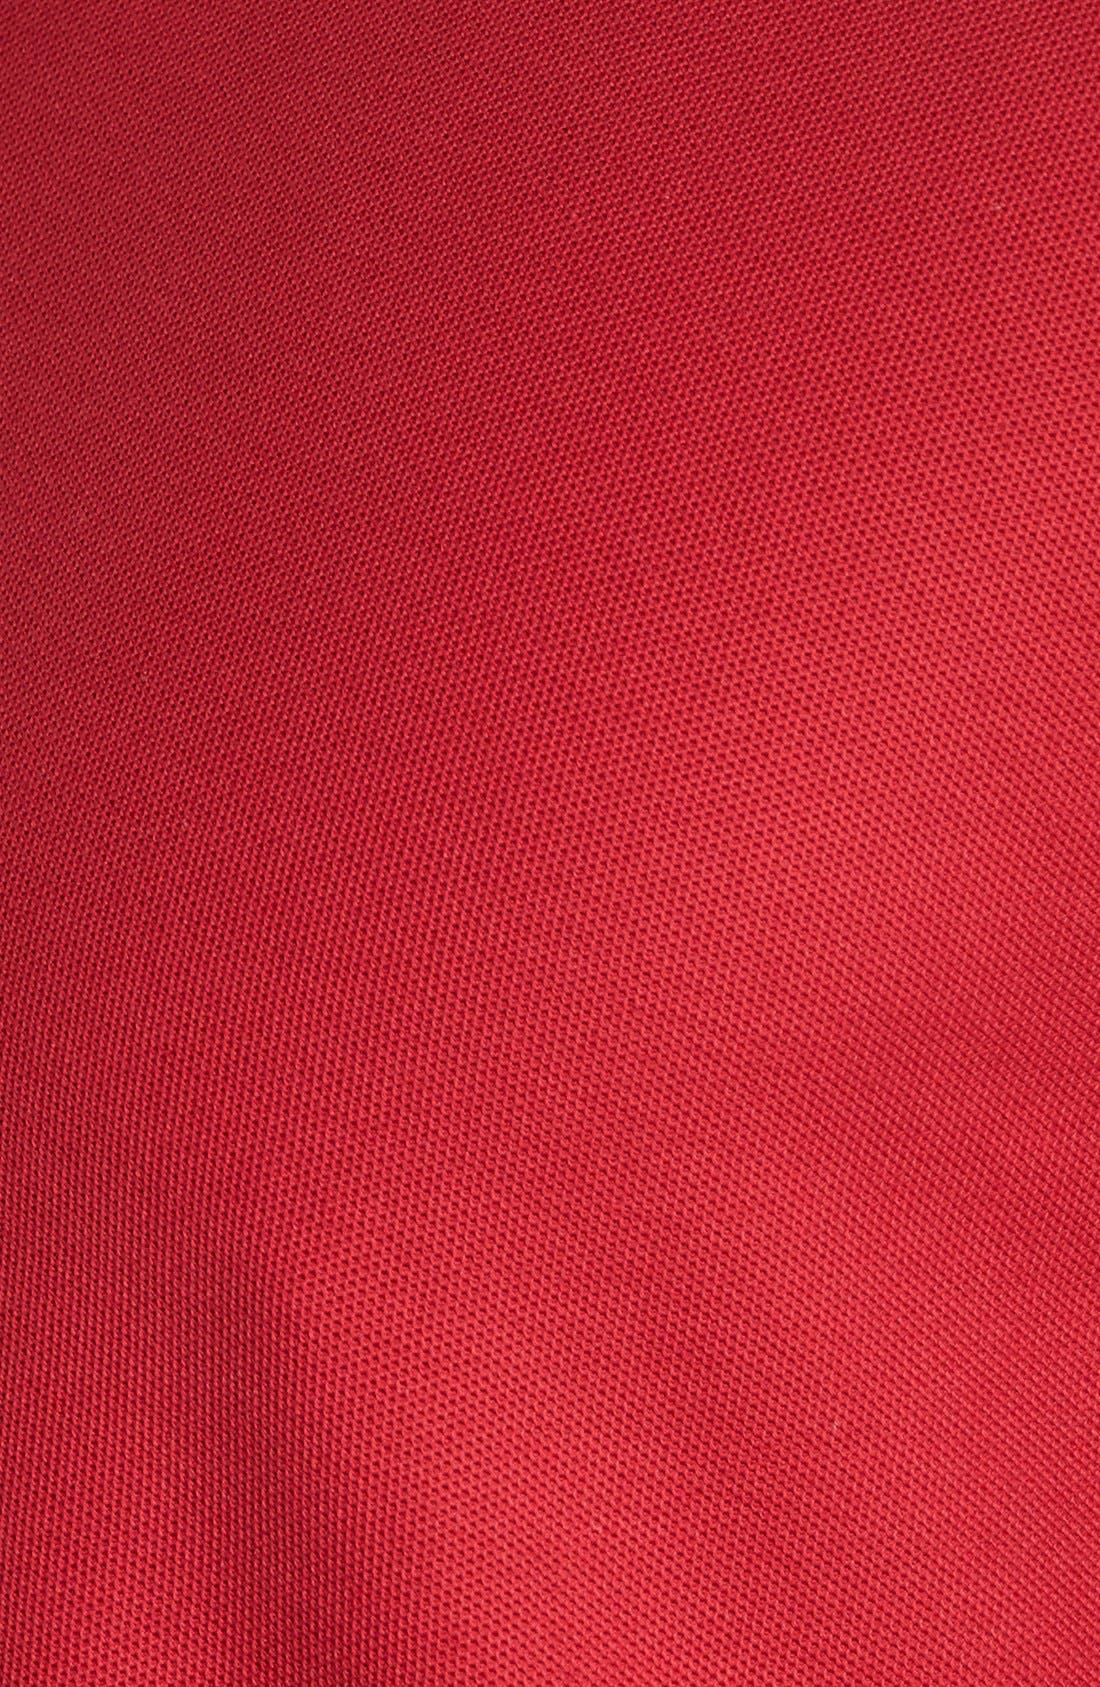 Alternate Image 5  - Nordstrom Men's Shop 'Classic' Regular Fit Piqué Polo (Big)